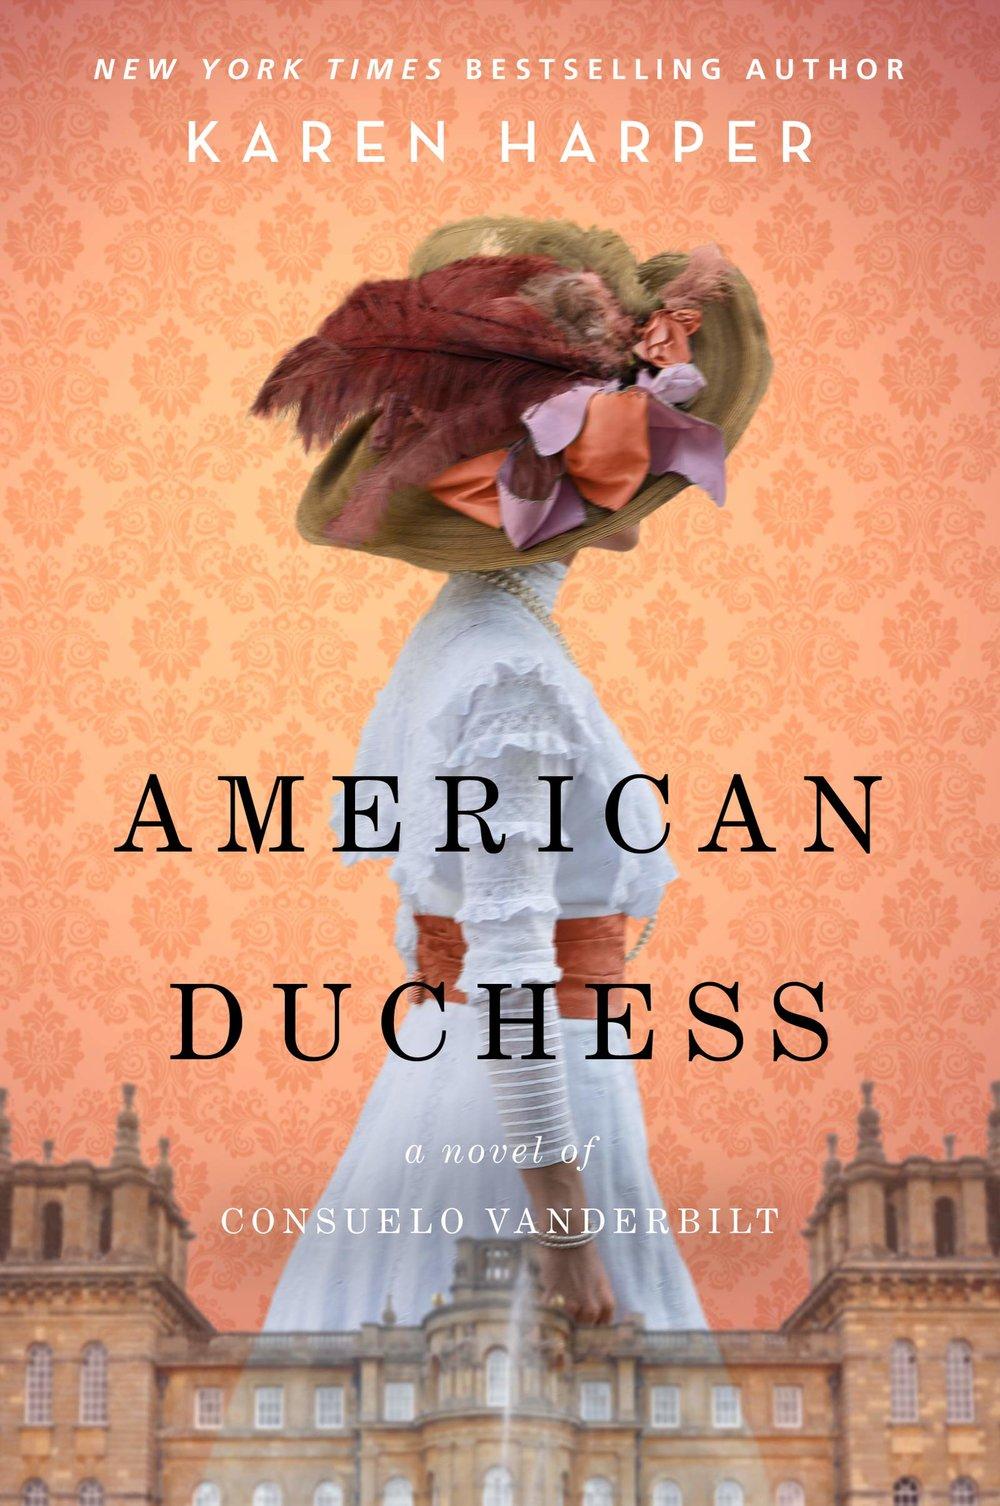 american duchess by karen harper.jpg